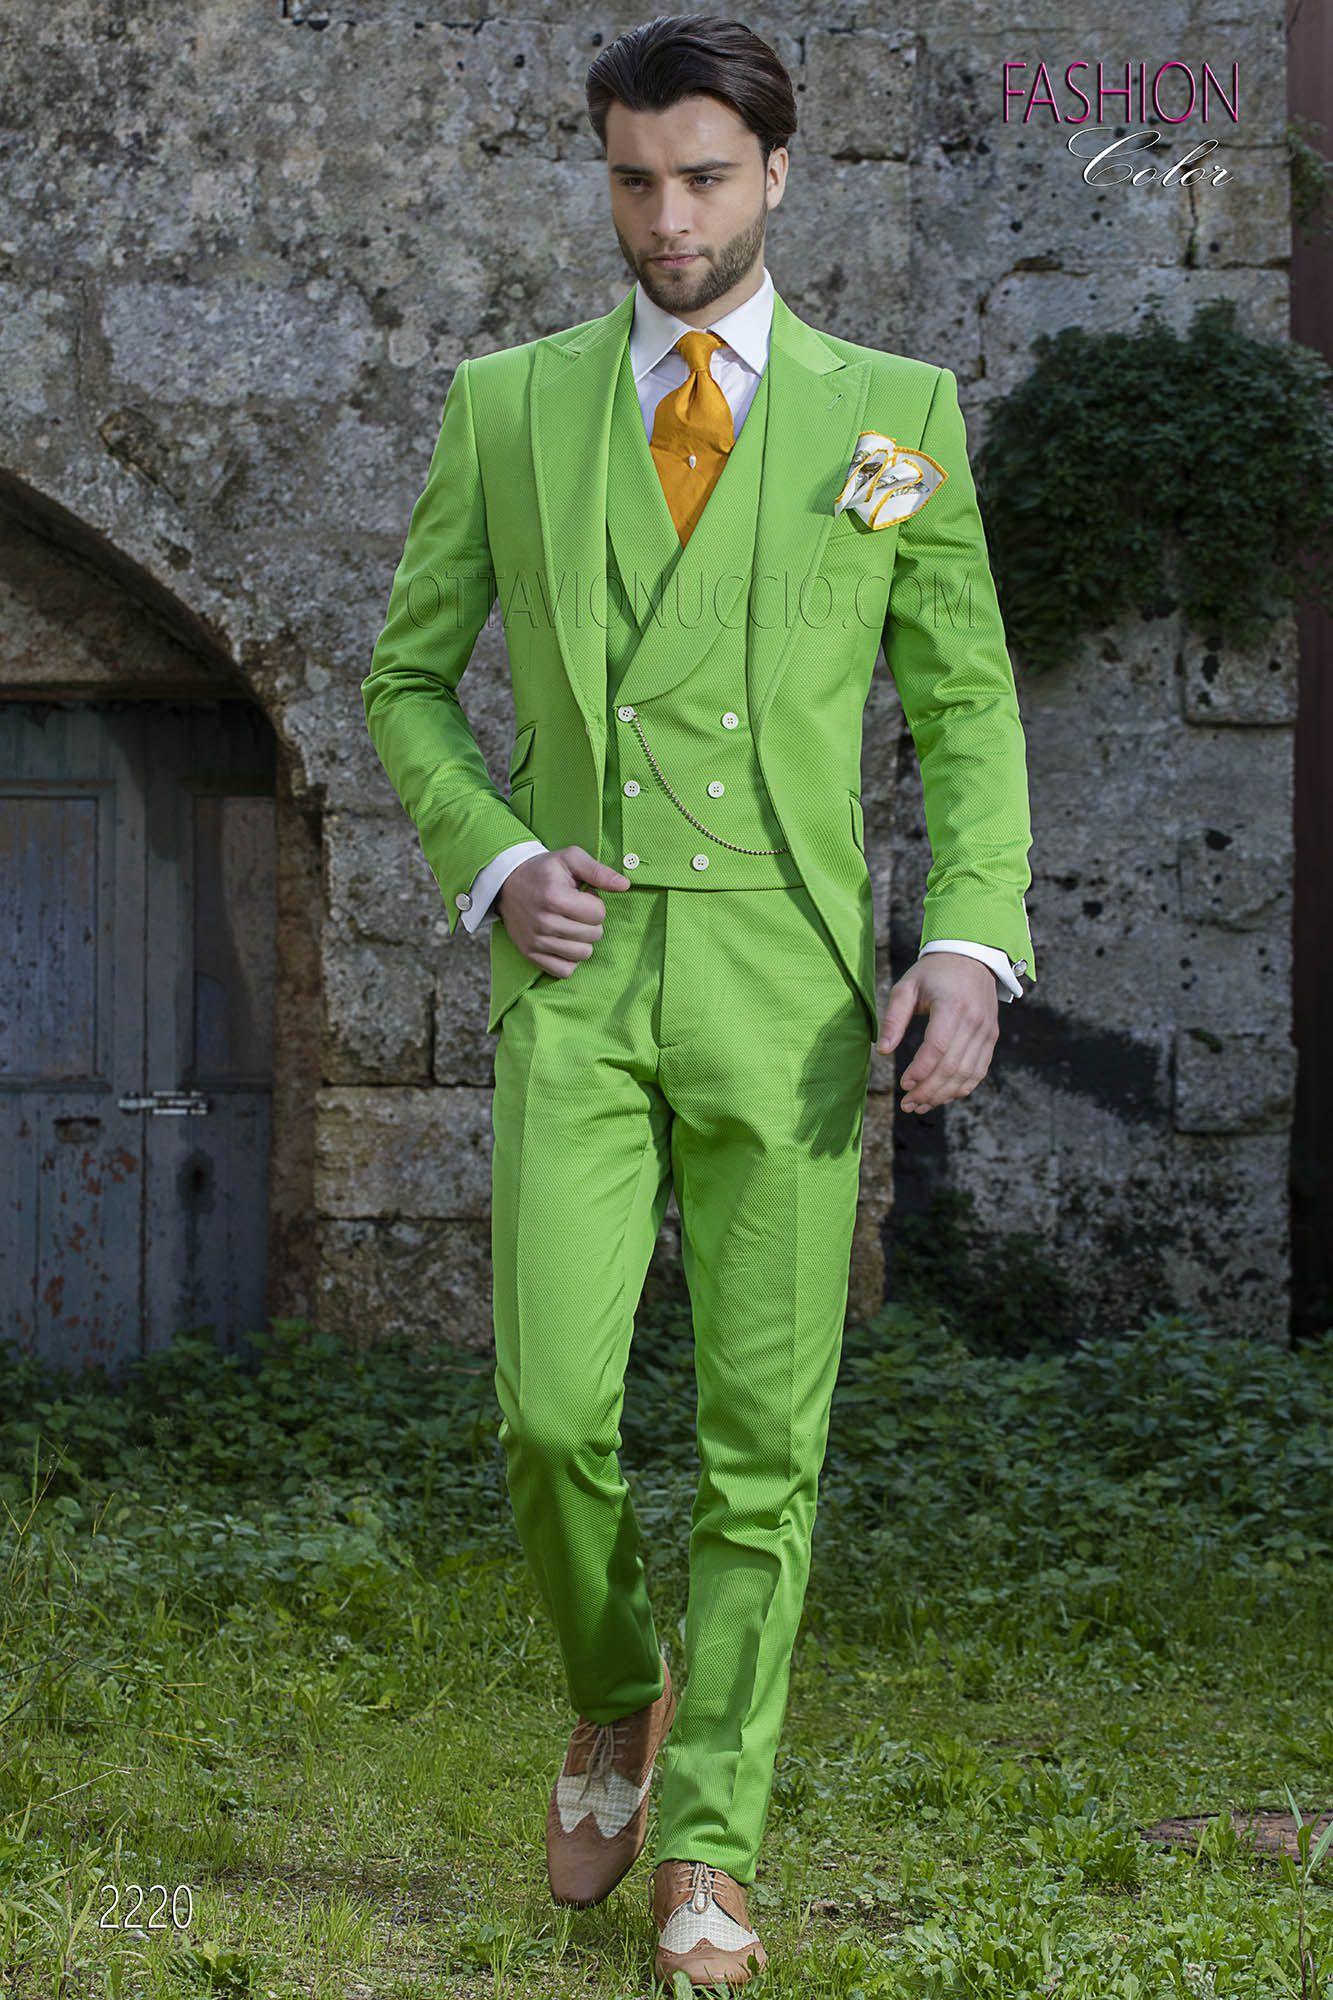 Costume mariage hipster vert pour homme. Costume ONGala 2220 Stili Smoking  Da Uomo e75418a4c4c